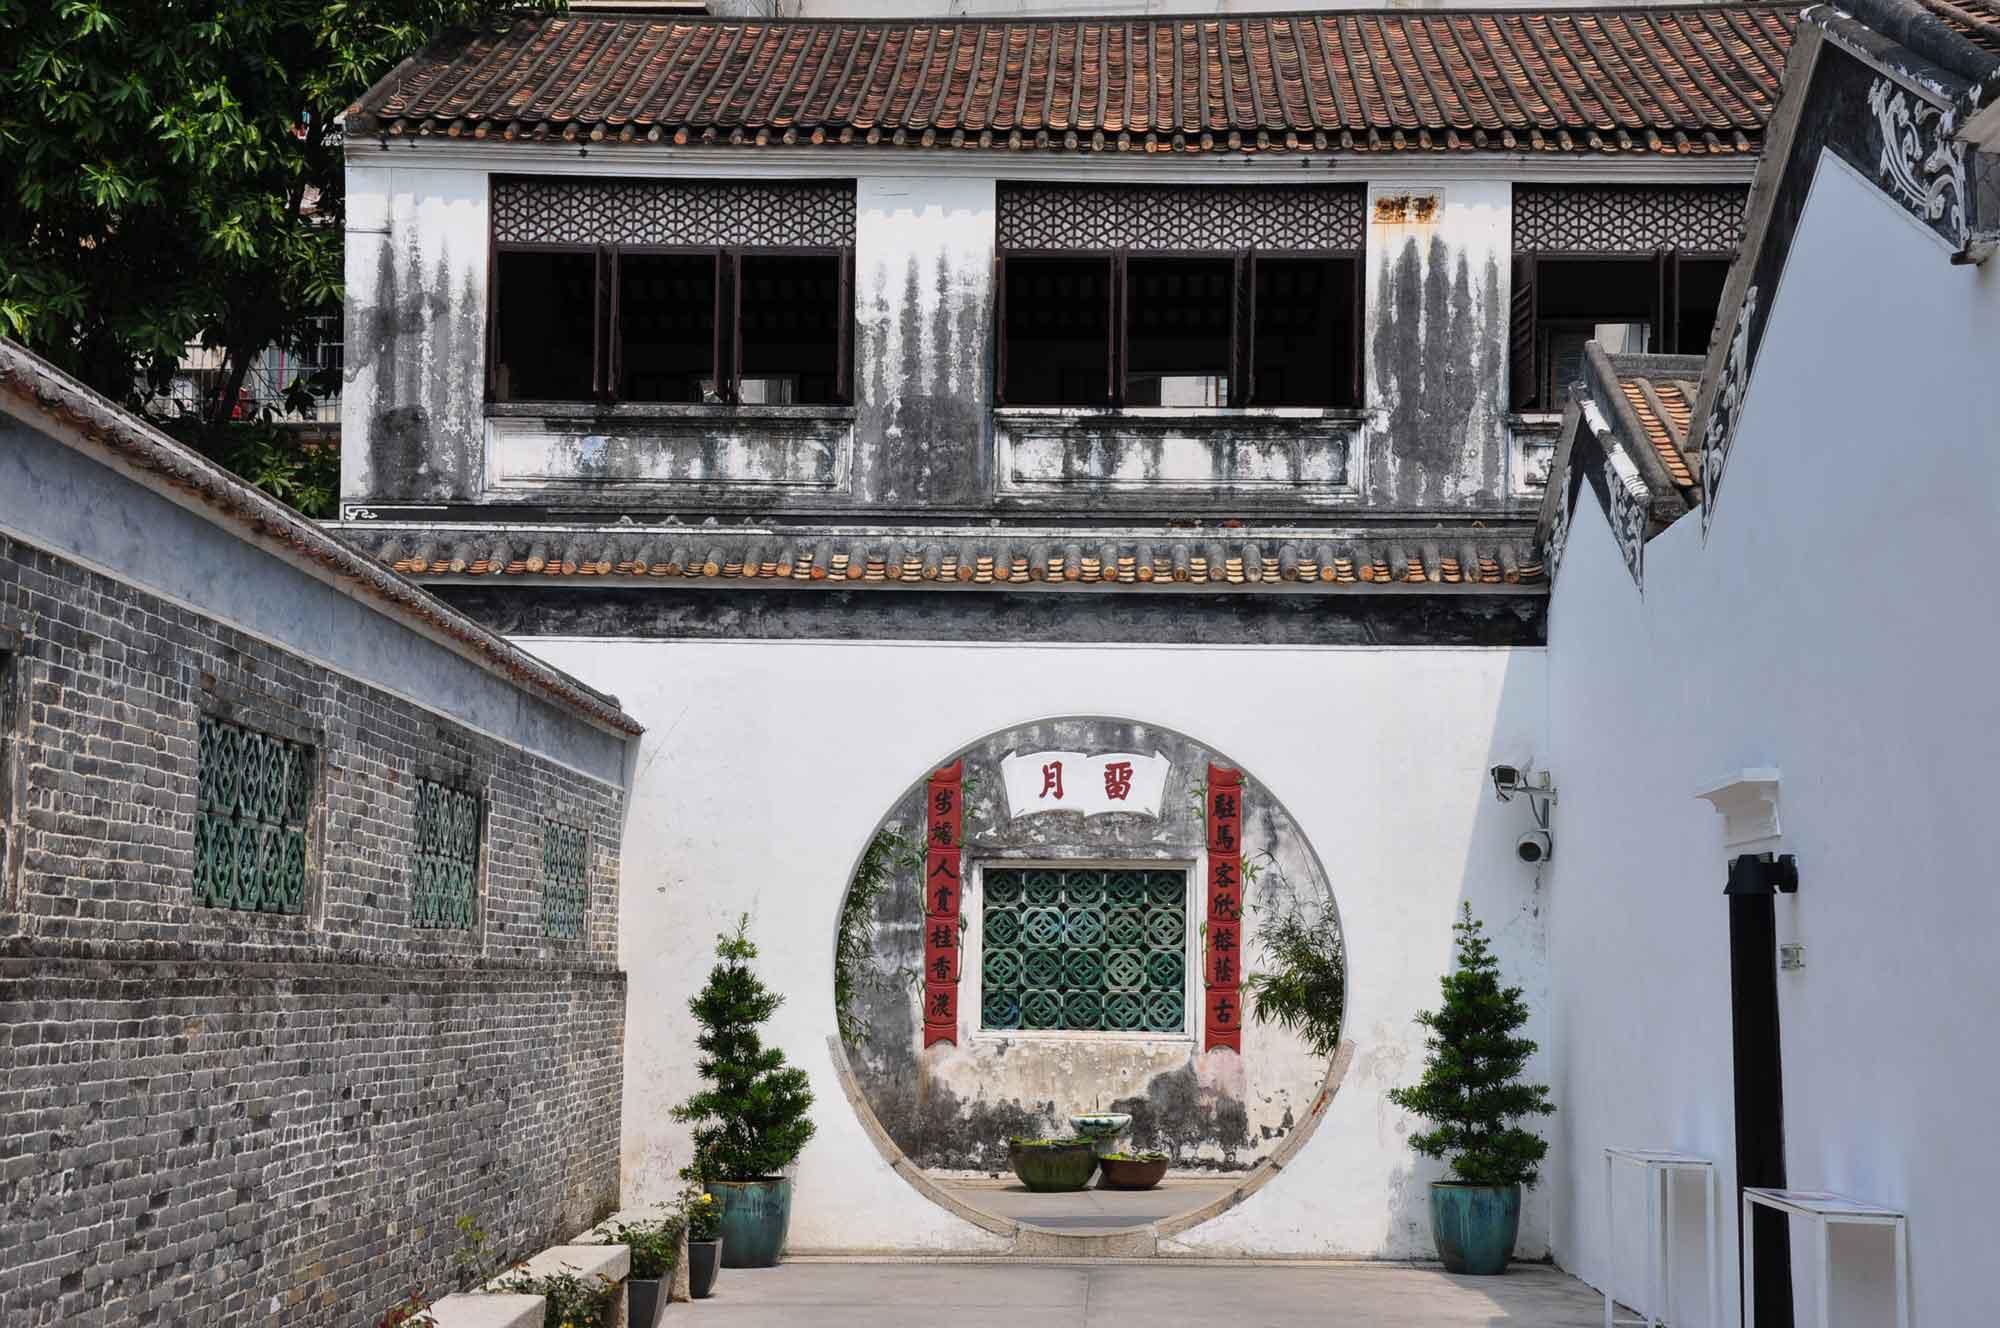 Macau world heritage site: Mandarin House moon gate